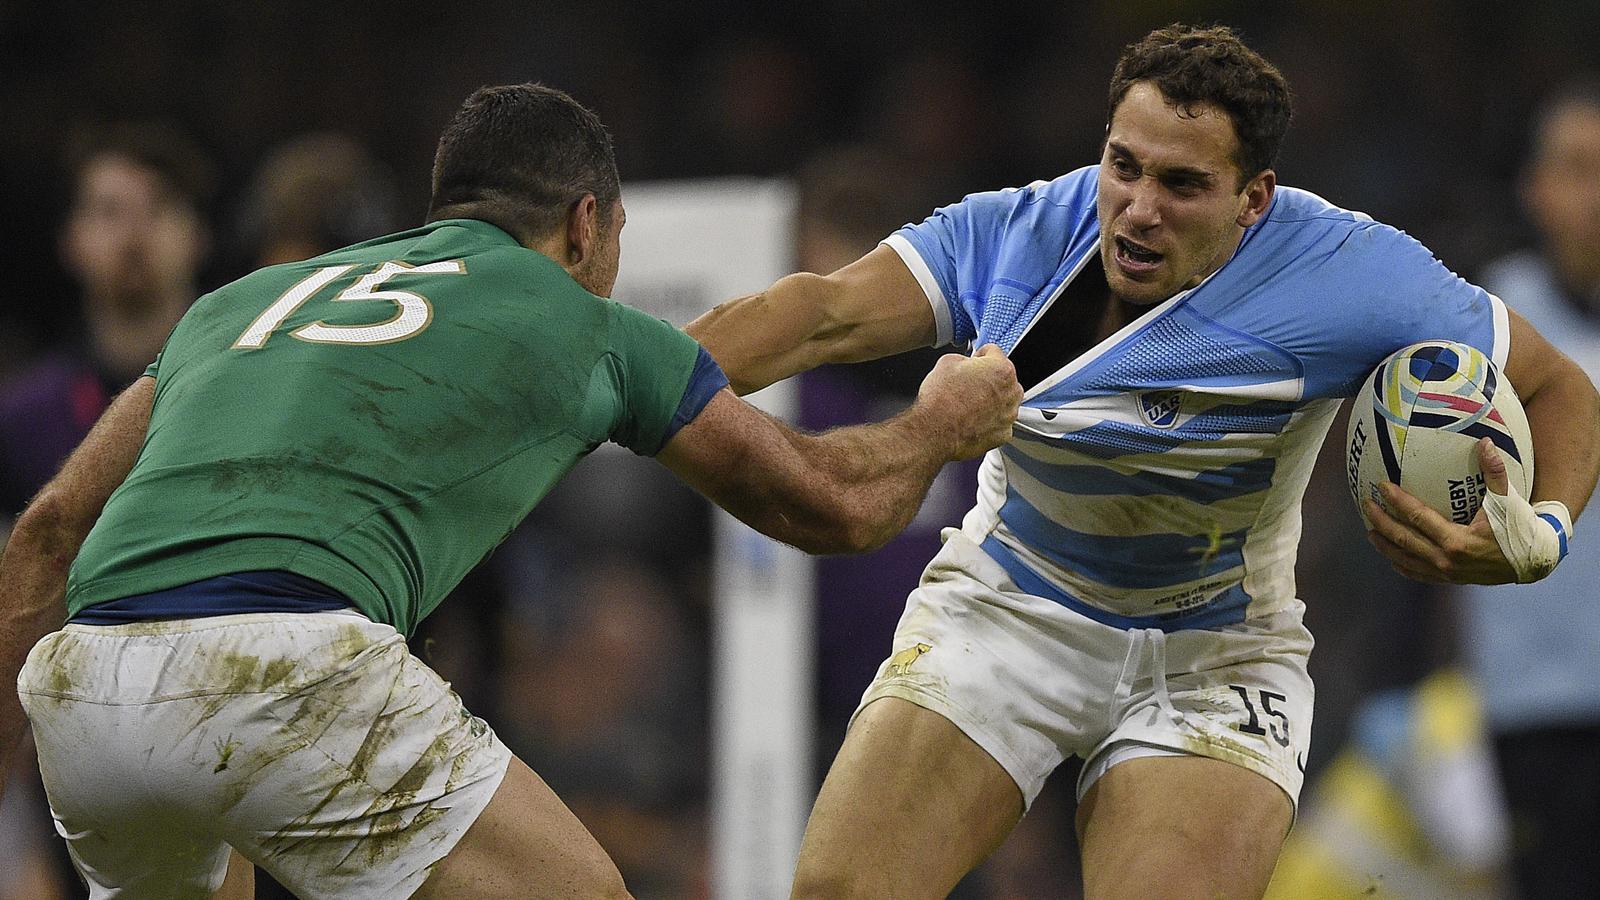 Joaquin Tuculet - Arrière de l'Argentine contre l'Irlande - 18 octobre 2015